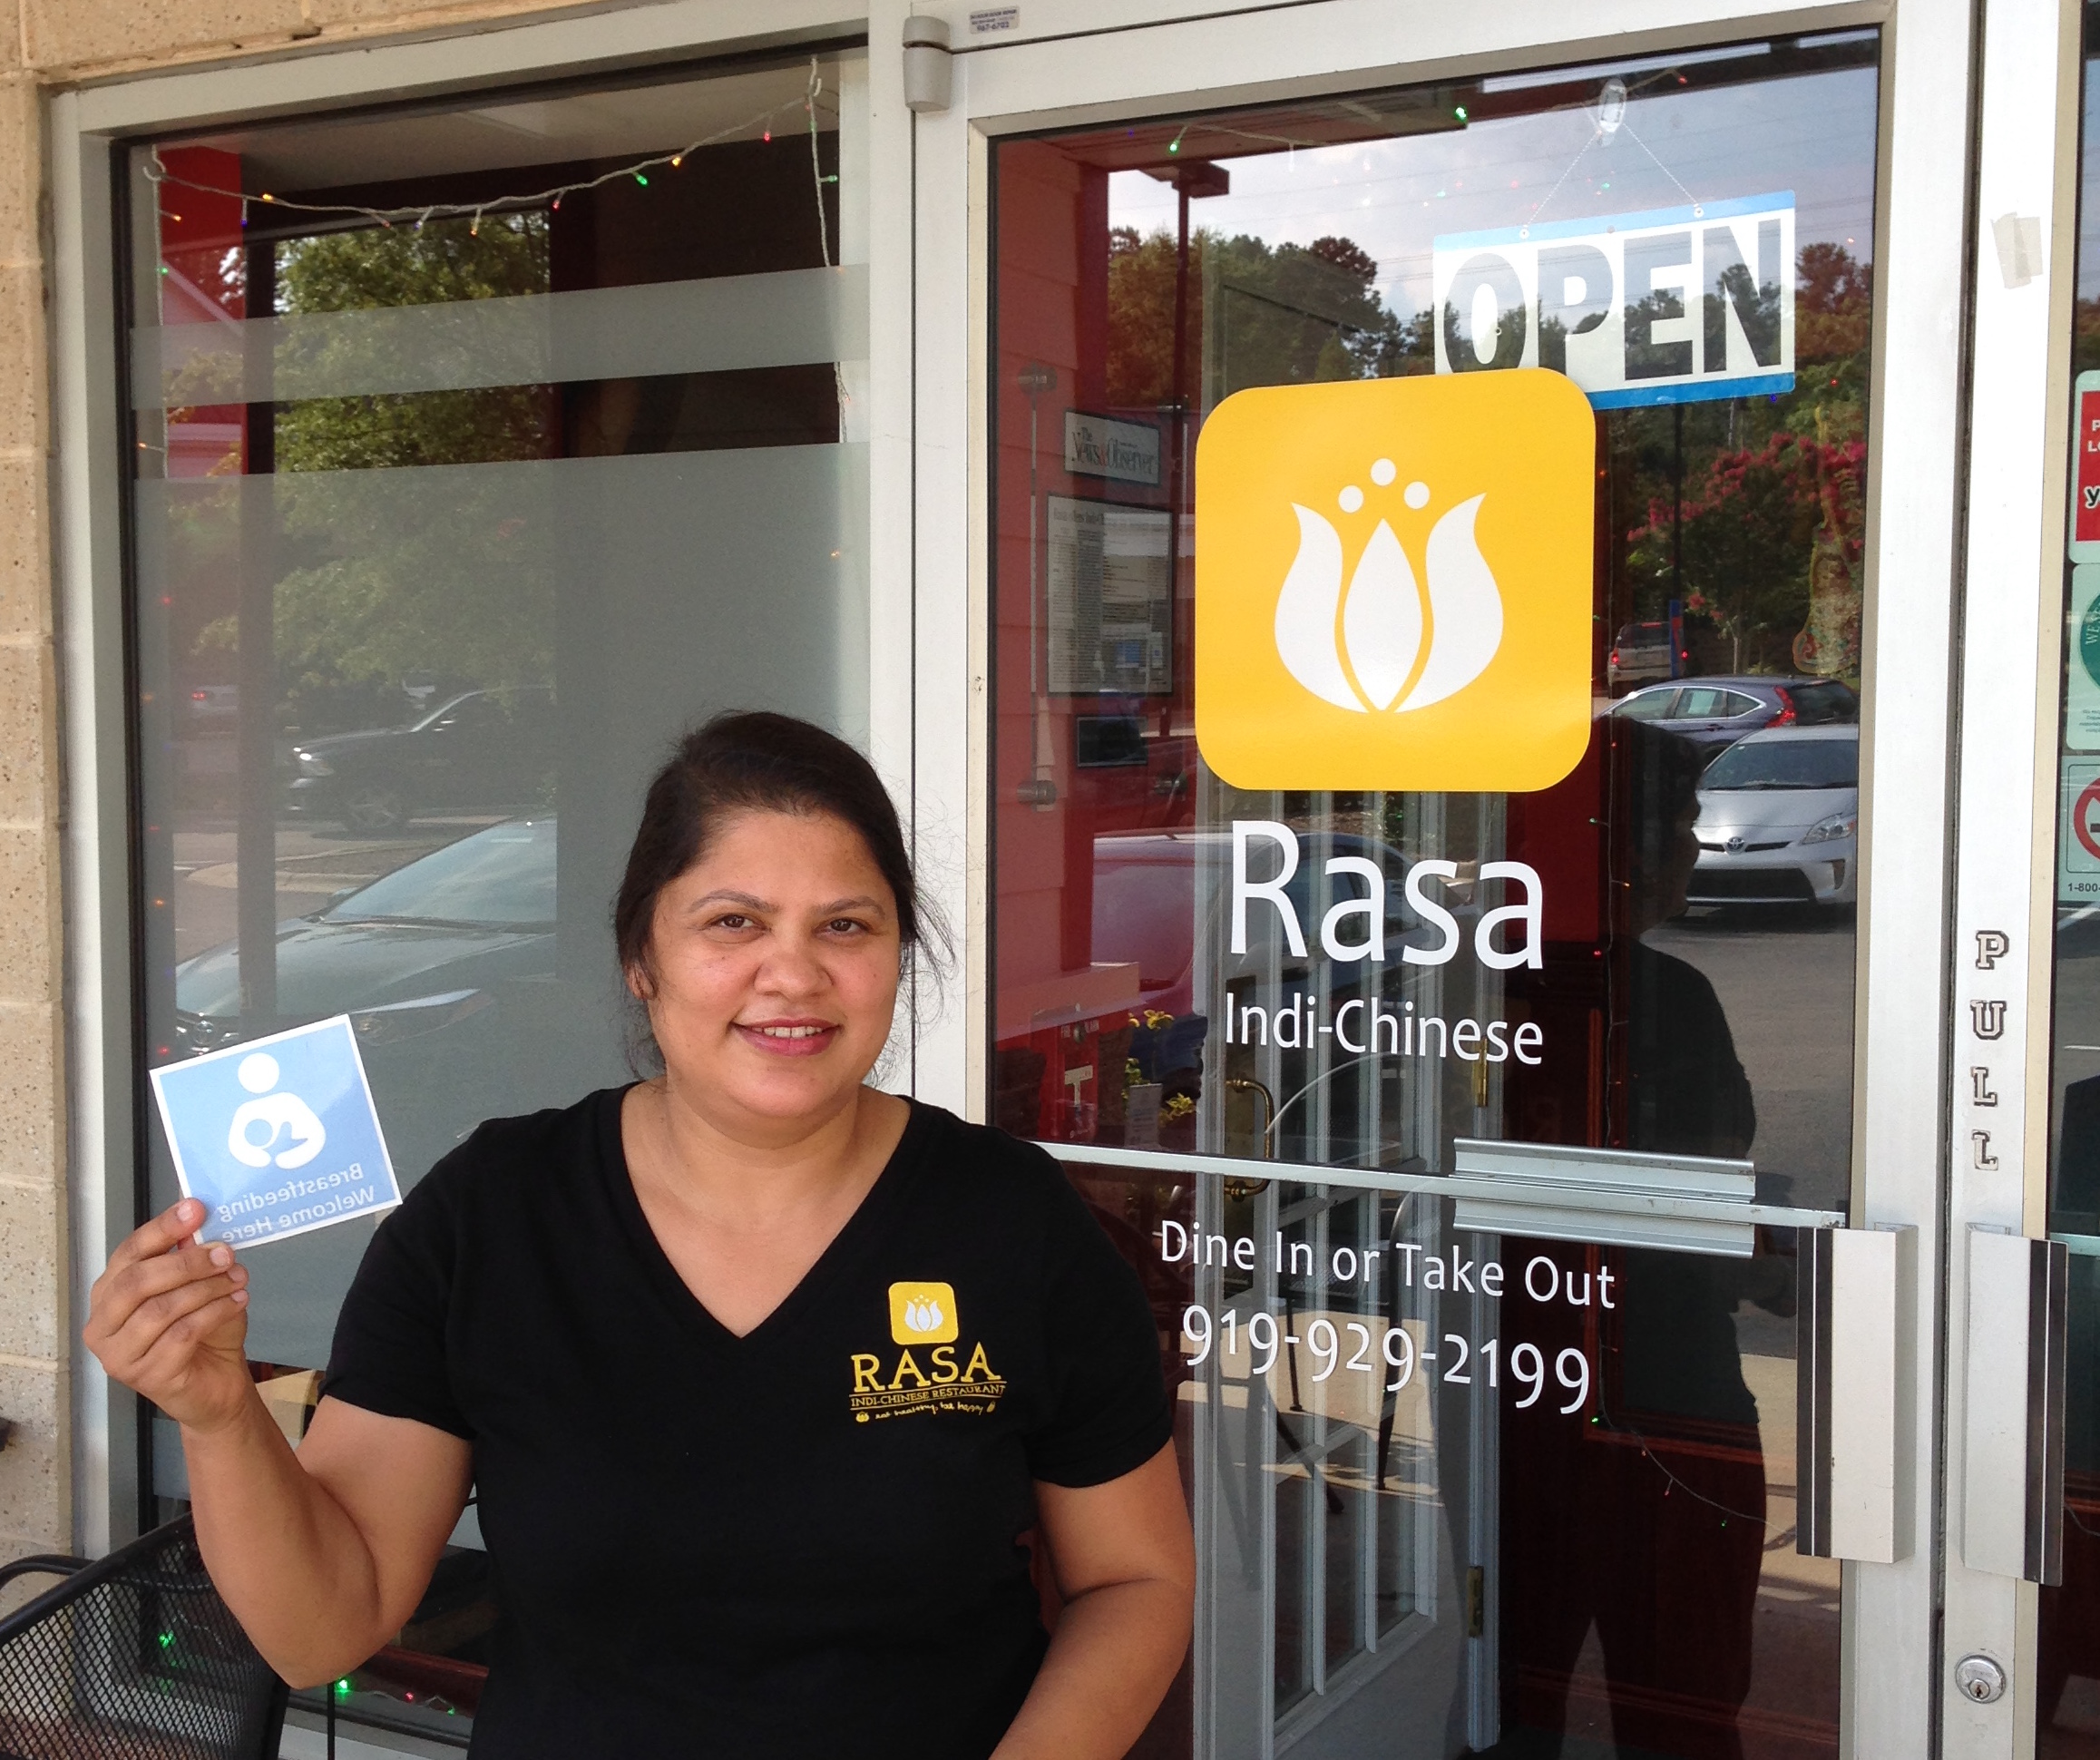 Employee of Rasa Indi-Chinese Restaurant standing in front of restaurant door holding breastfeeding communities cling